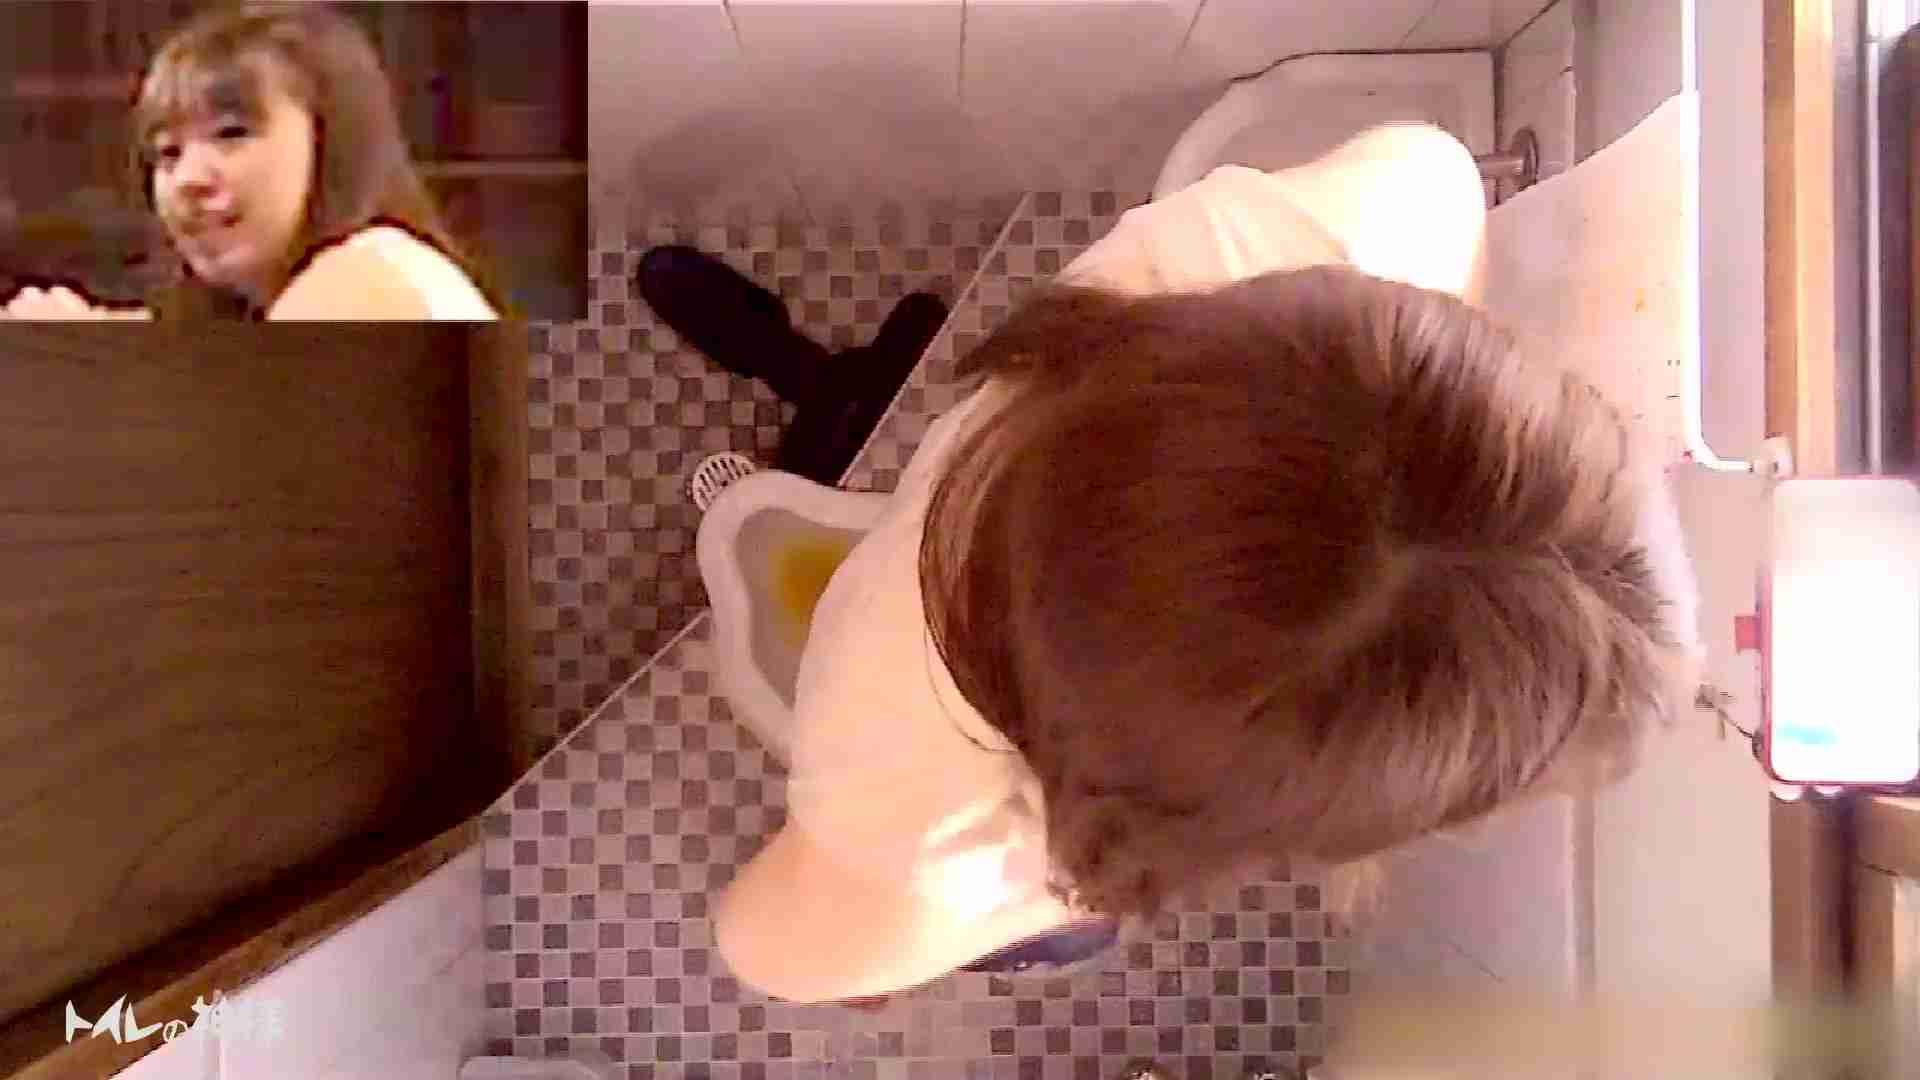 Vol.06 花の女子大生どうですか3点撮り!! トイレ流出 オマンコ無修正動画無料 106連発 26